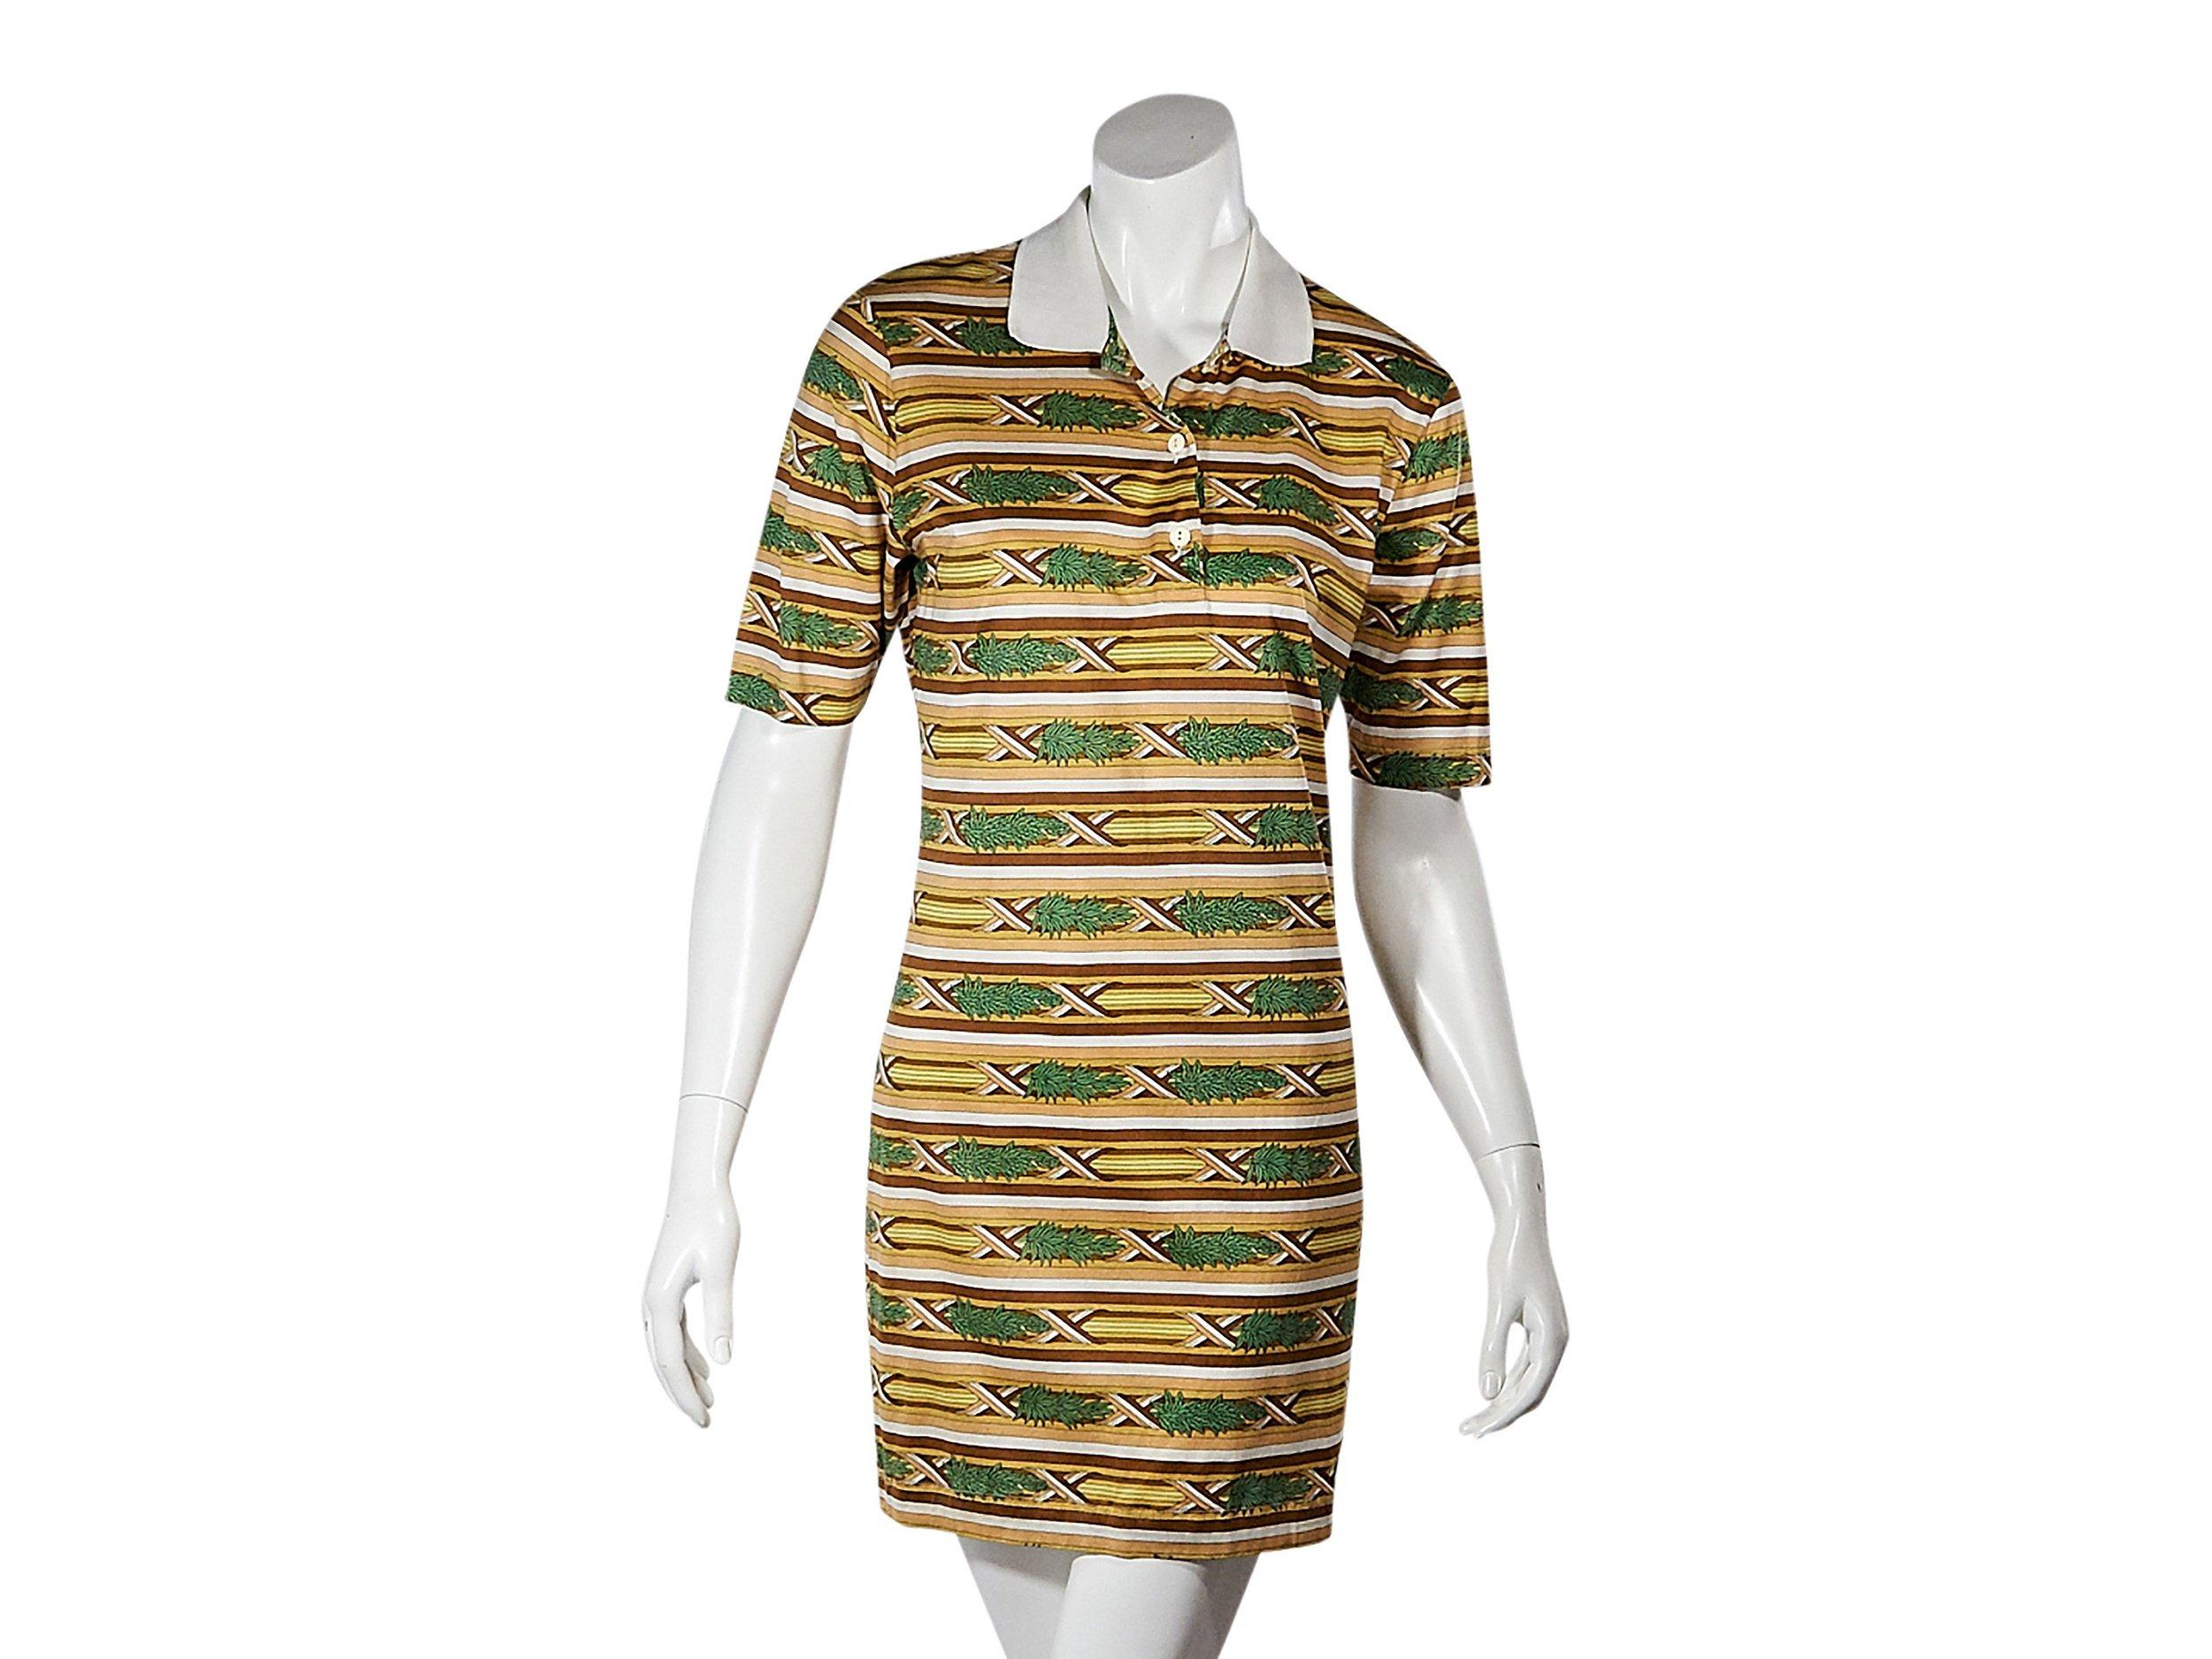 HERMÈS Multicolor Vintage Striped Shirtdress; Size: S; $385.00